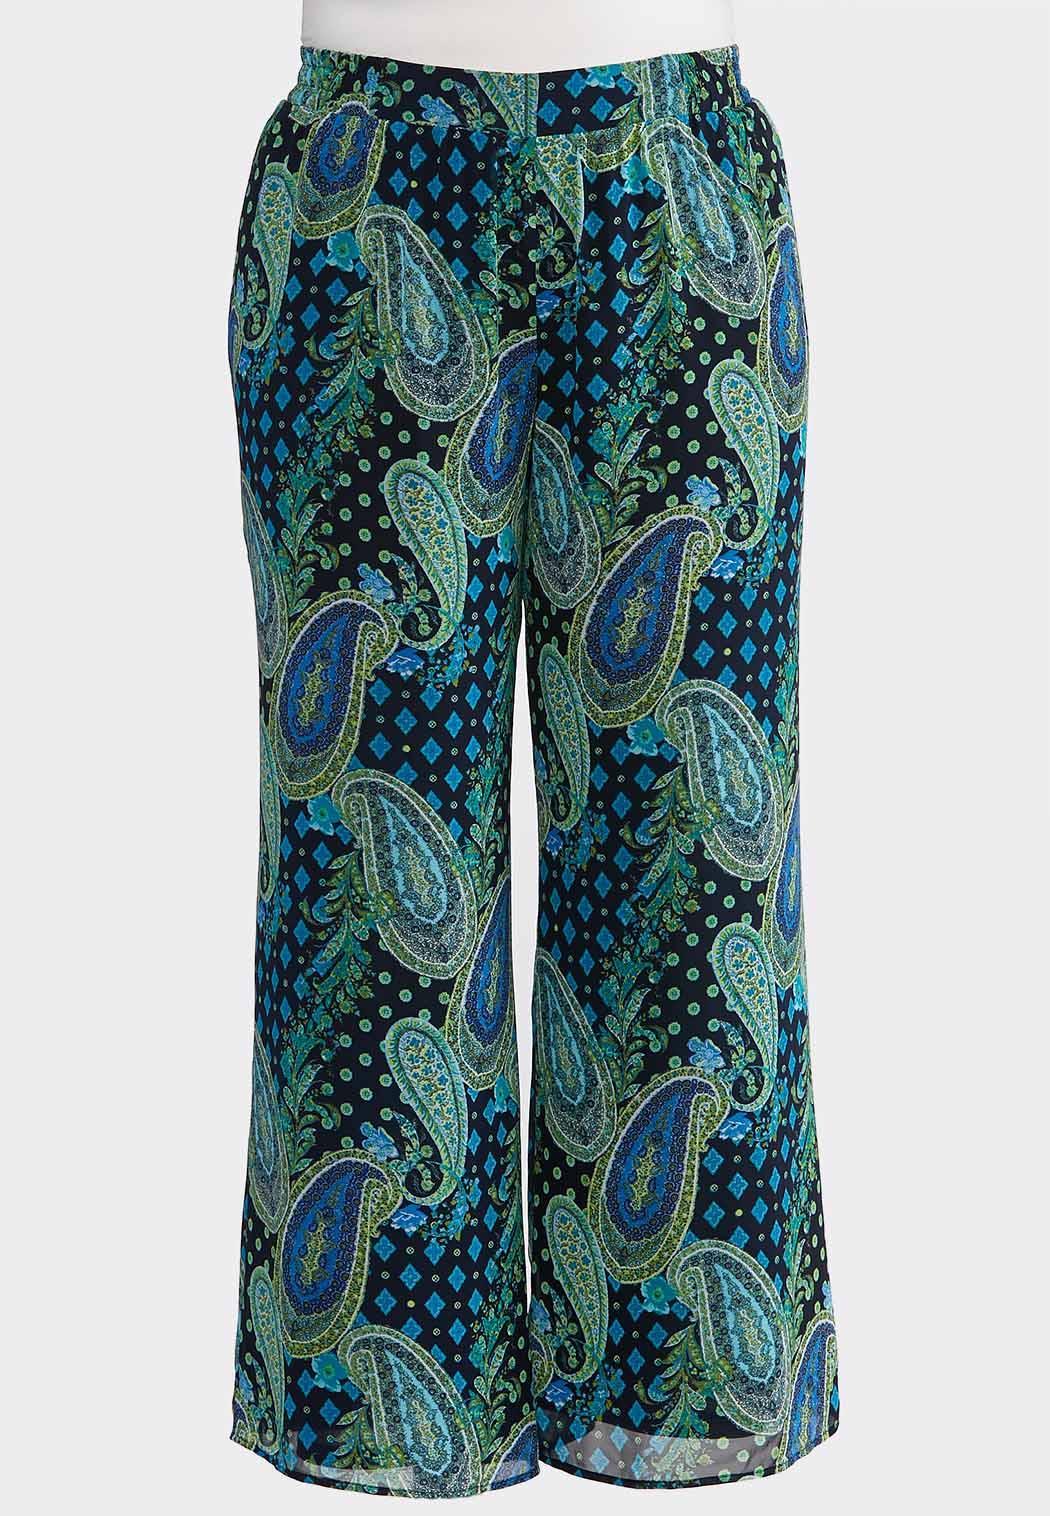 b7b1150bec5 Plus Size Paisley Palazzo Pants Wide Leg Cato Fashions